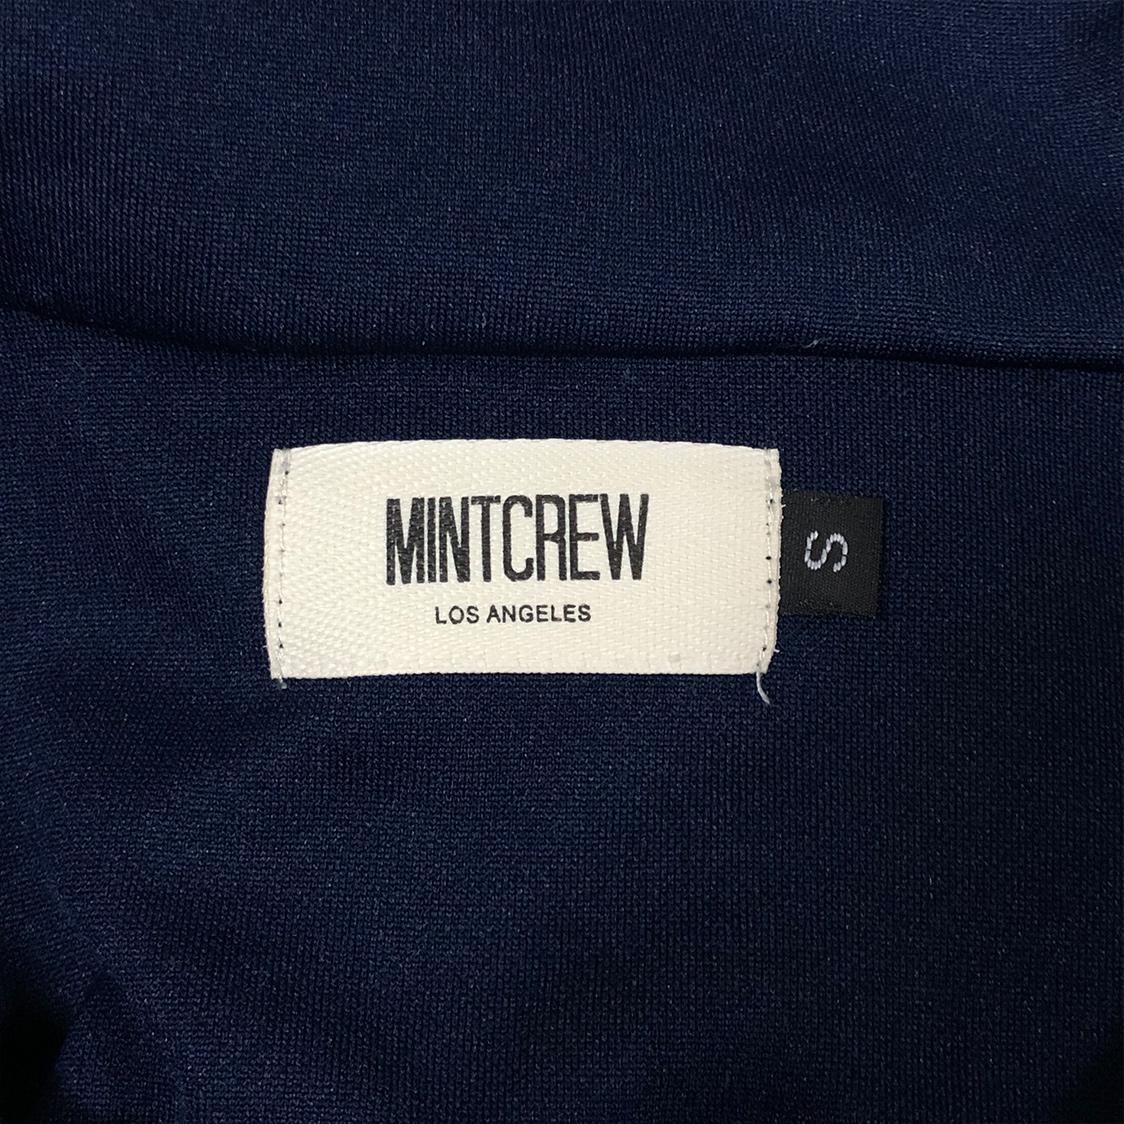 MINT CREW ミントクルー 【Sサイズ】 トラック ジャケット ジャージ ネイビー サイドライン / mnml